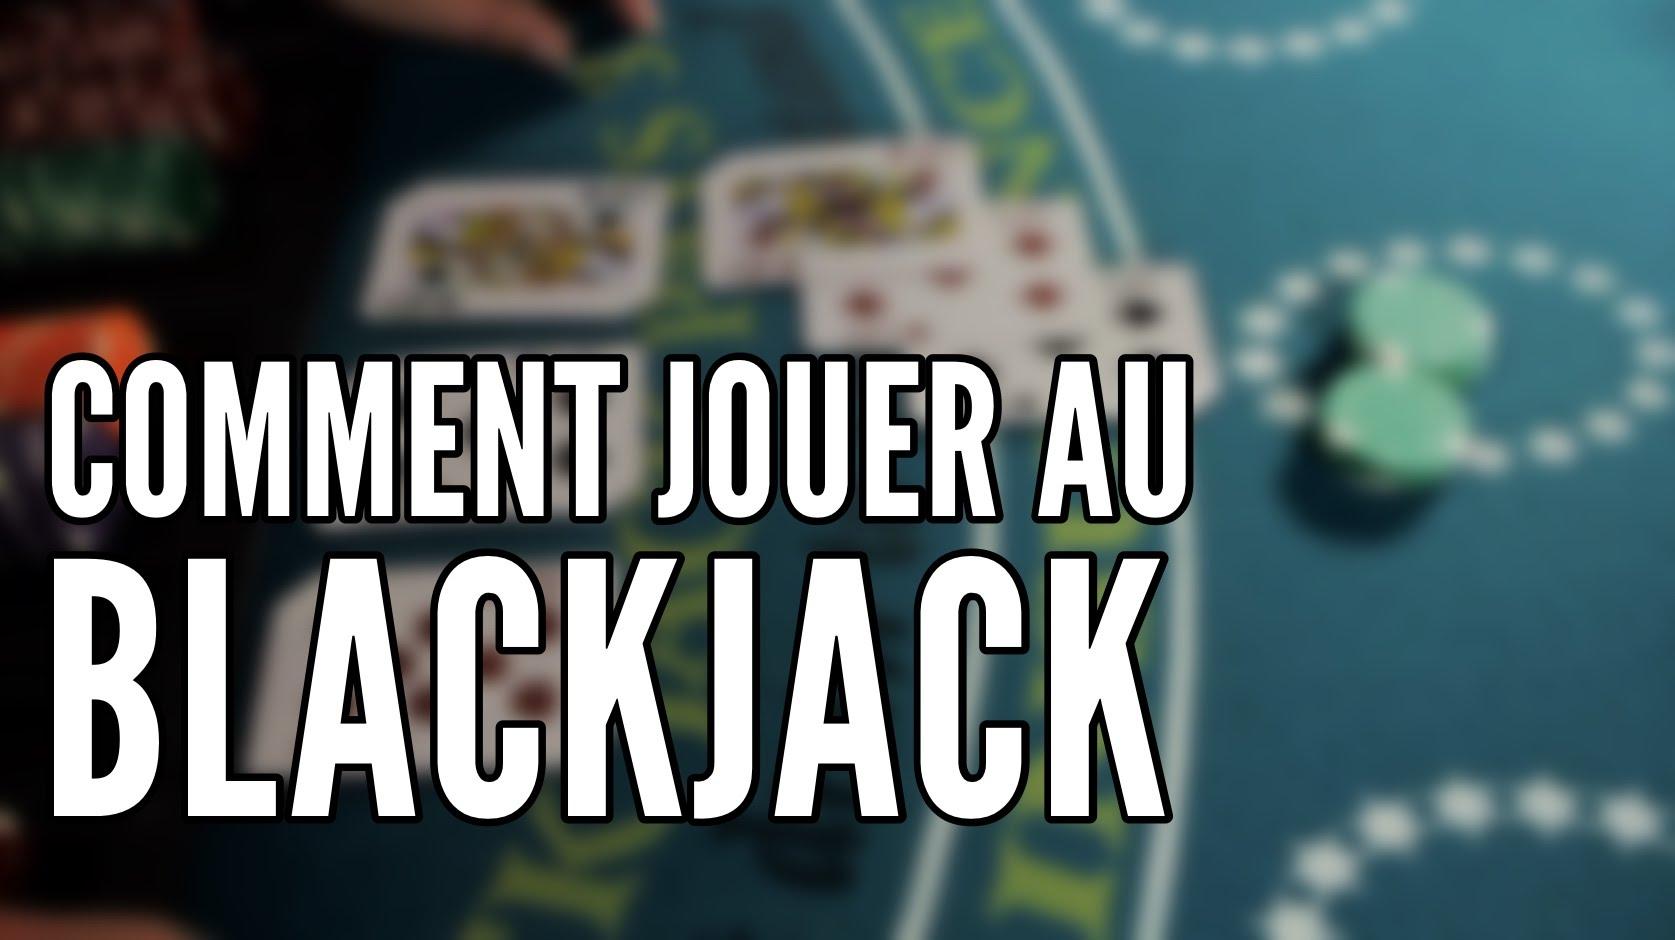 Blackjack France: un jeu de mathématiques non de hasard